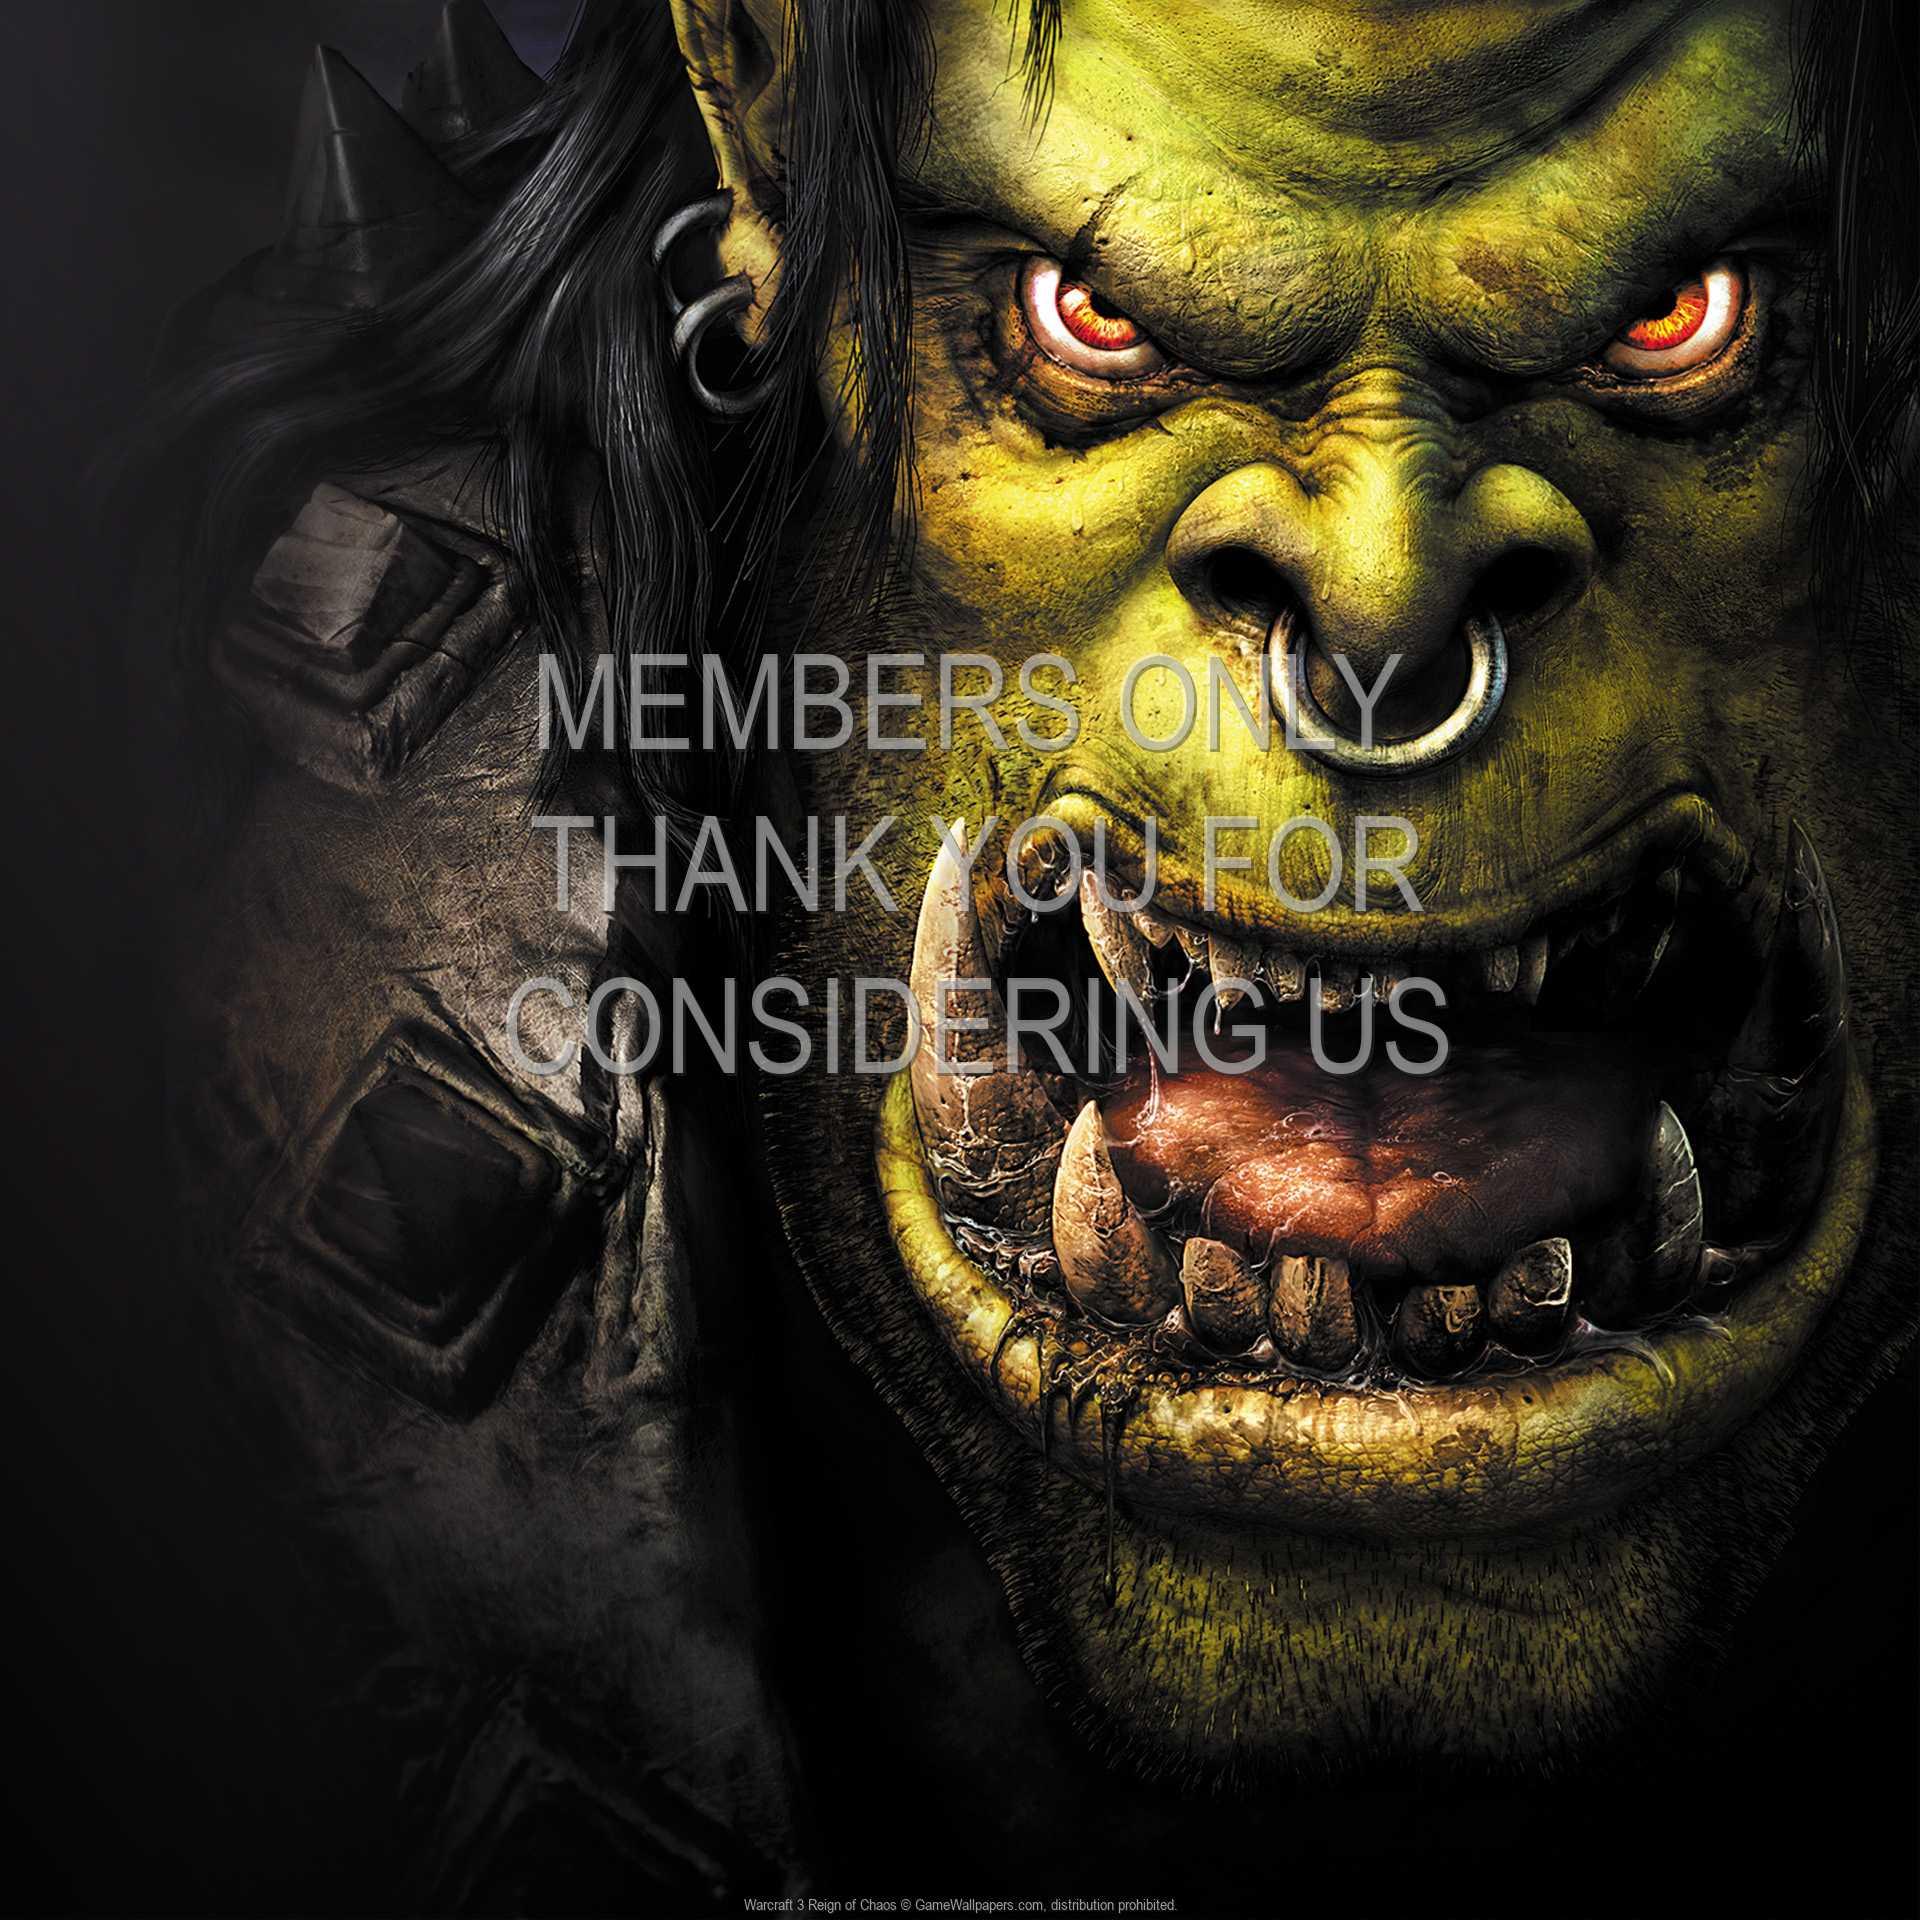 Warcraft 3: Reign of Chaos 1080p Horizontal Handy Hintergrundbild 21